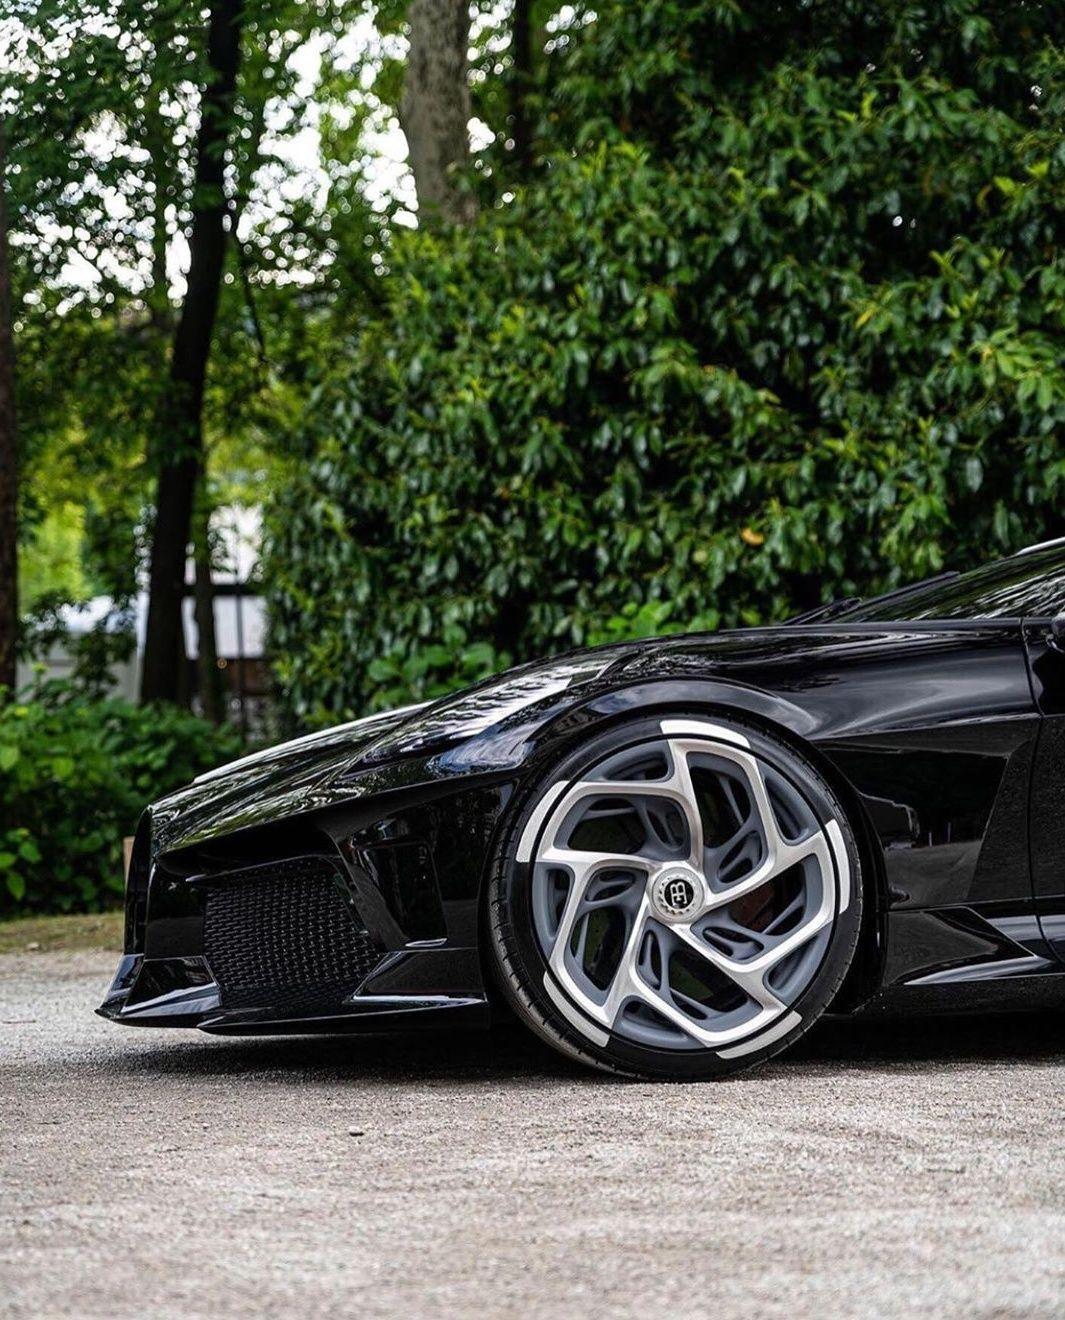 Bugatti Cars, Bugatti, Car